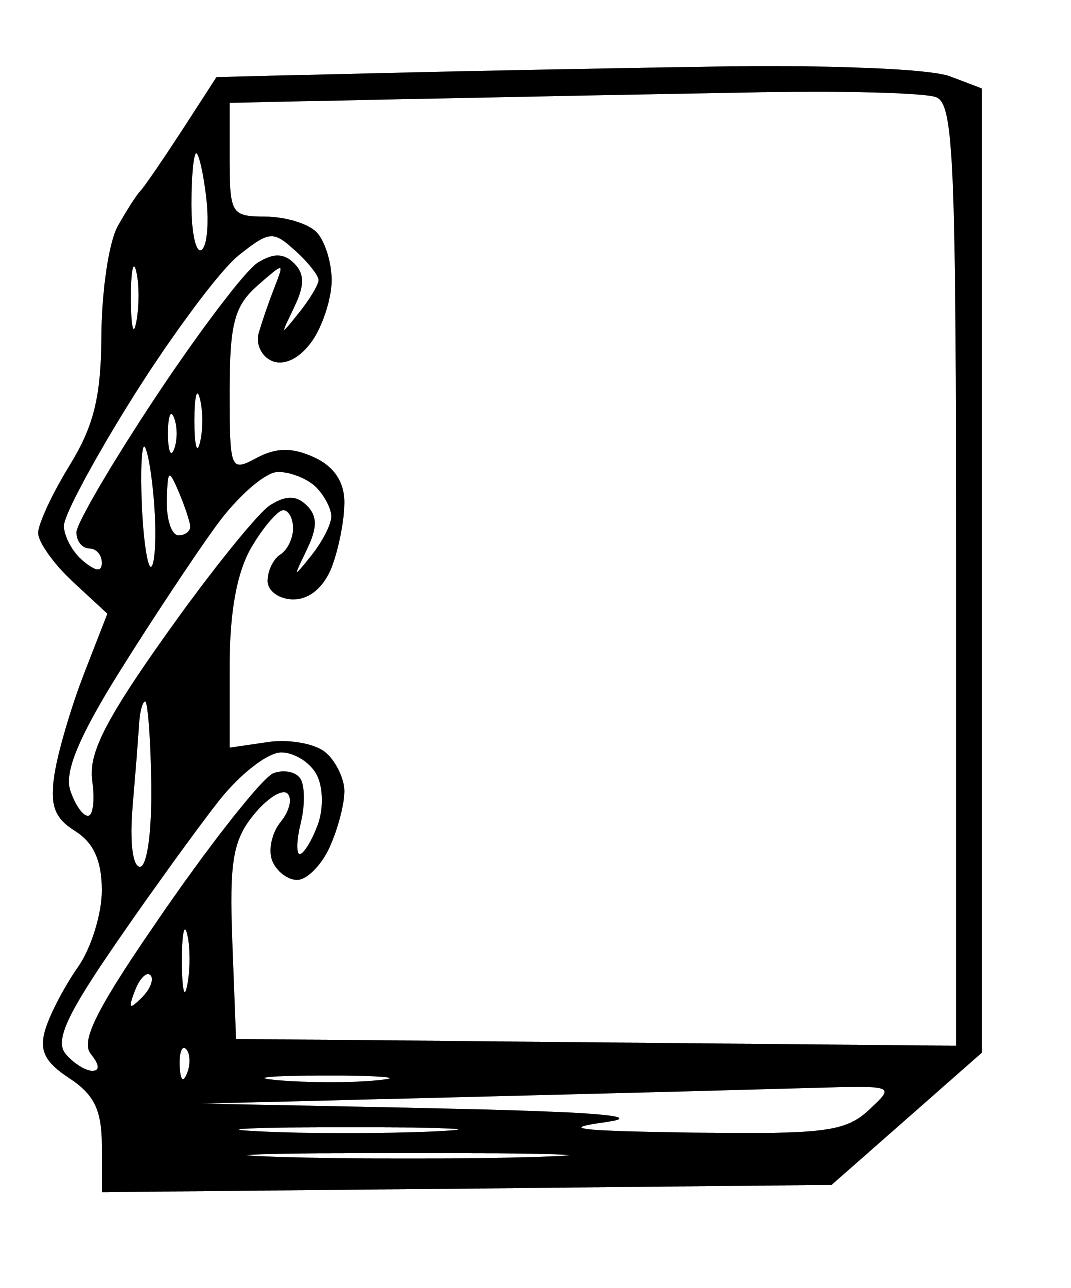 1071x1288 Book Of Mormon Clip Art Many Interesting Cliparts